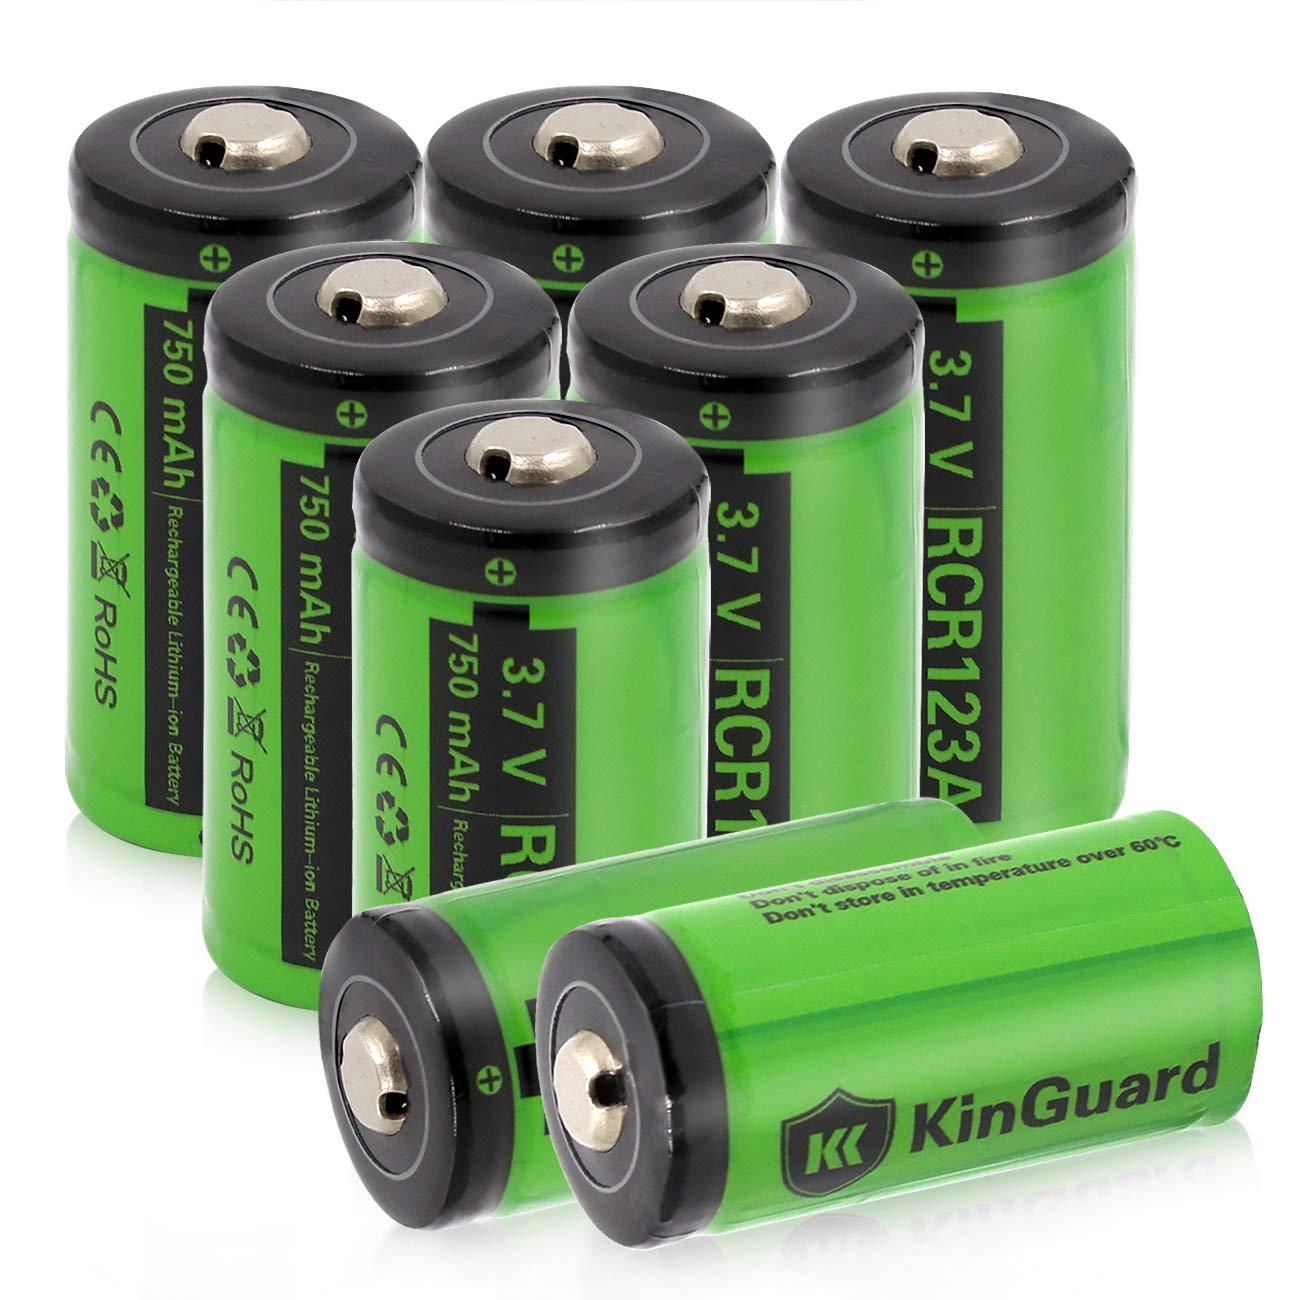 KinGuard RCR123A Rechargeable Batteries 3.7V 750mAh CR123A Lithium Battery for Arlo Camera VMC3030 VMK3200 VMS3330 3430 3530 Flashlight - 8 Pack by KinGuard